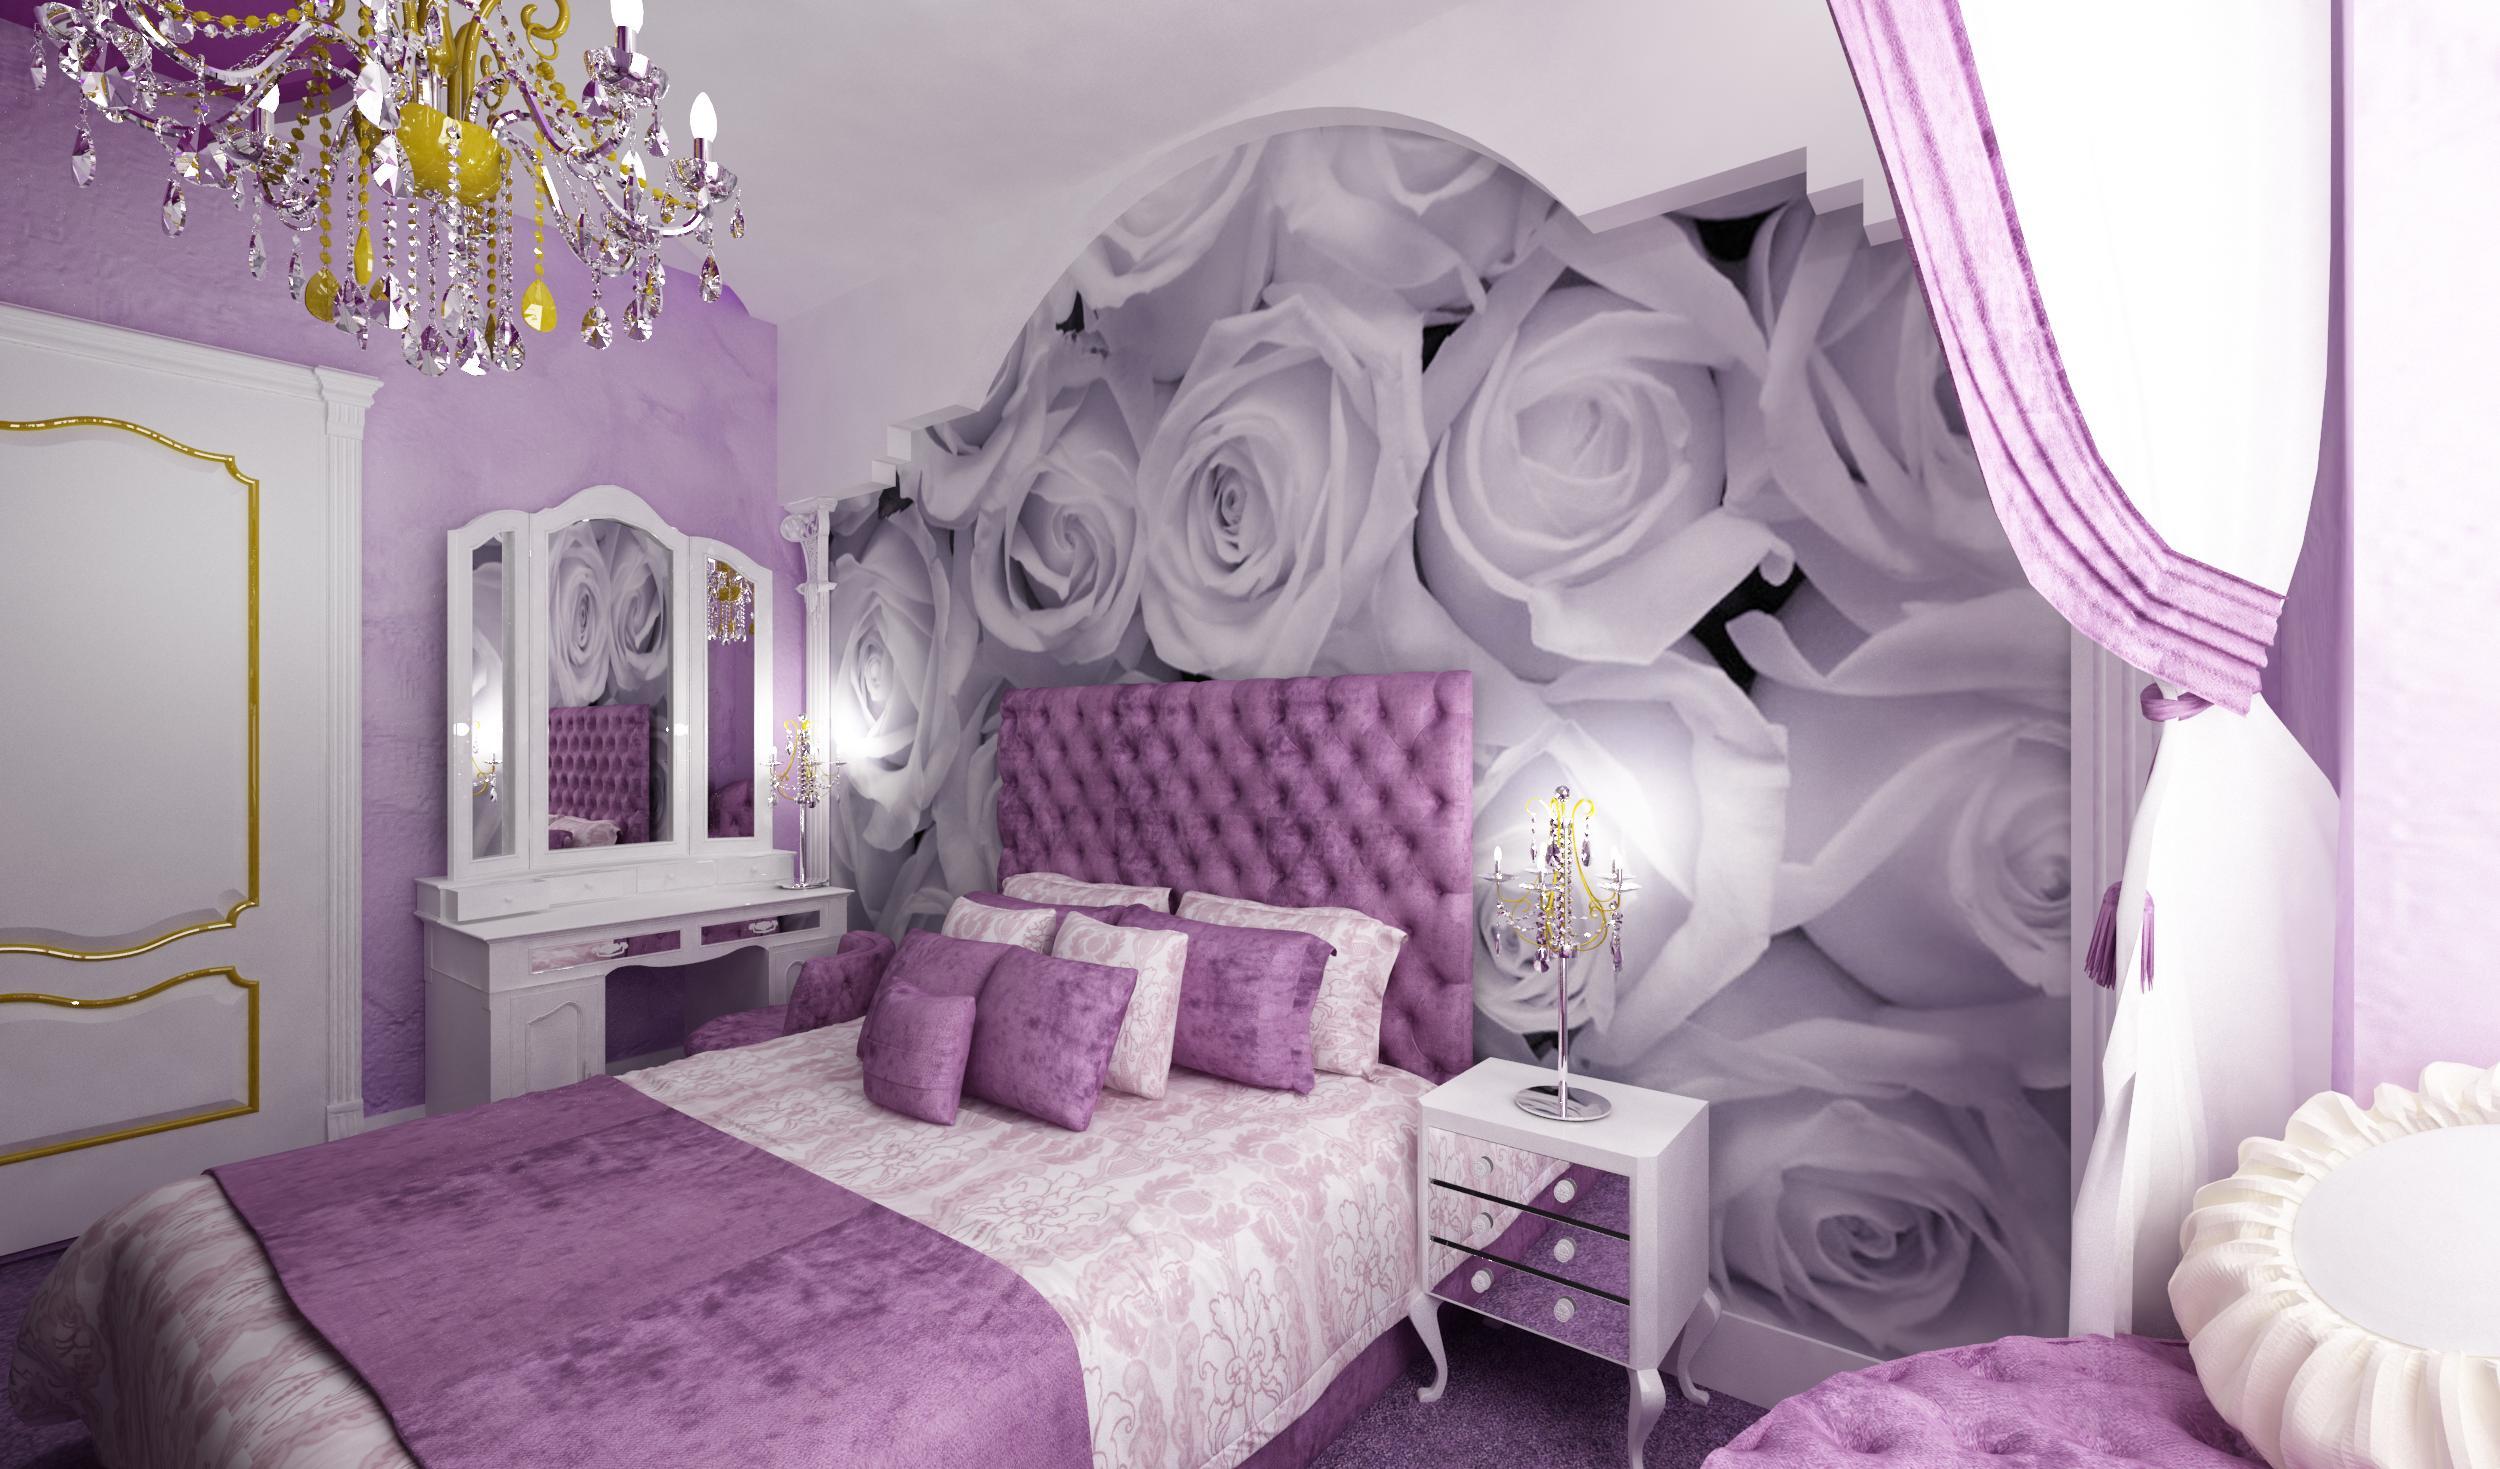 Фото сиреневой спальни дизайн фото